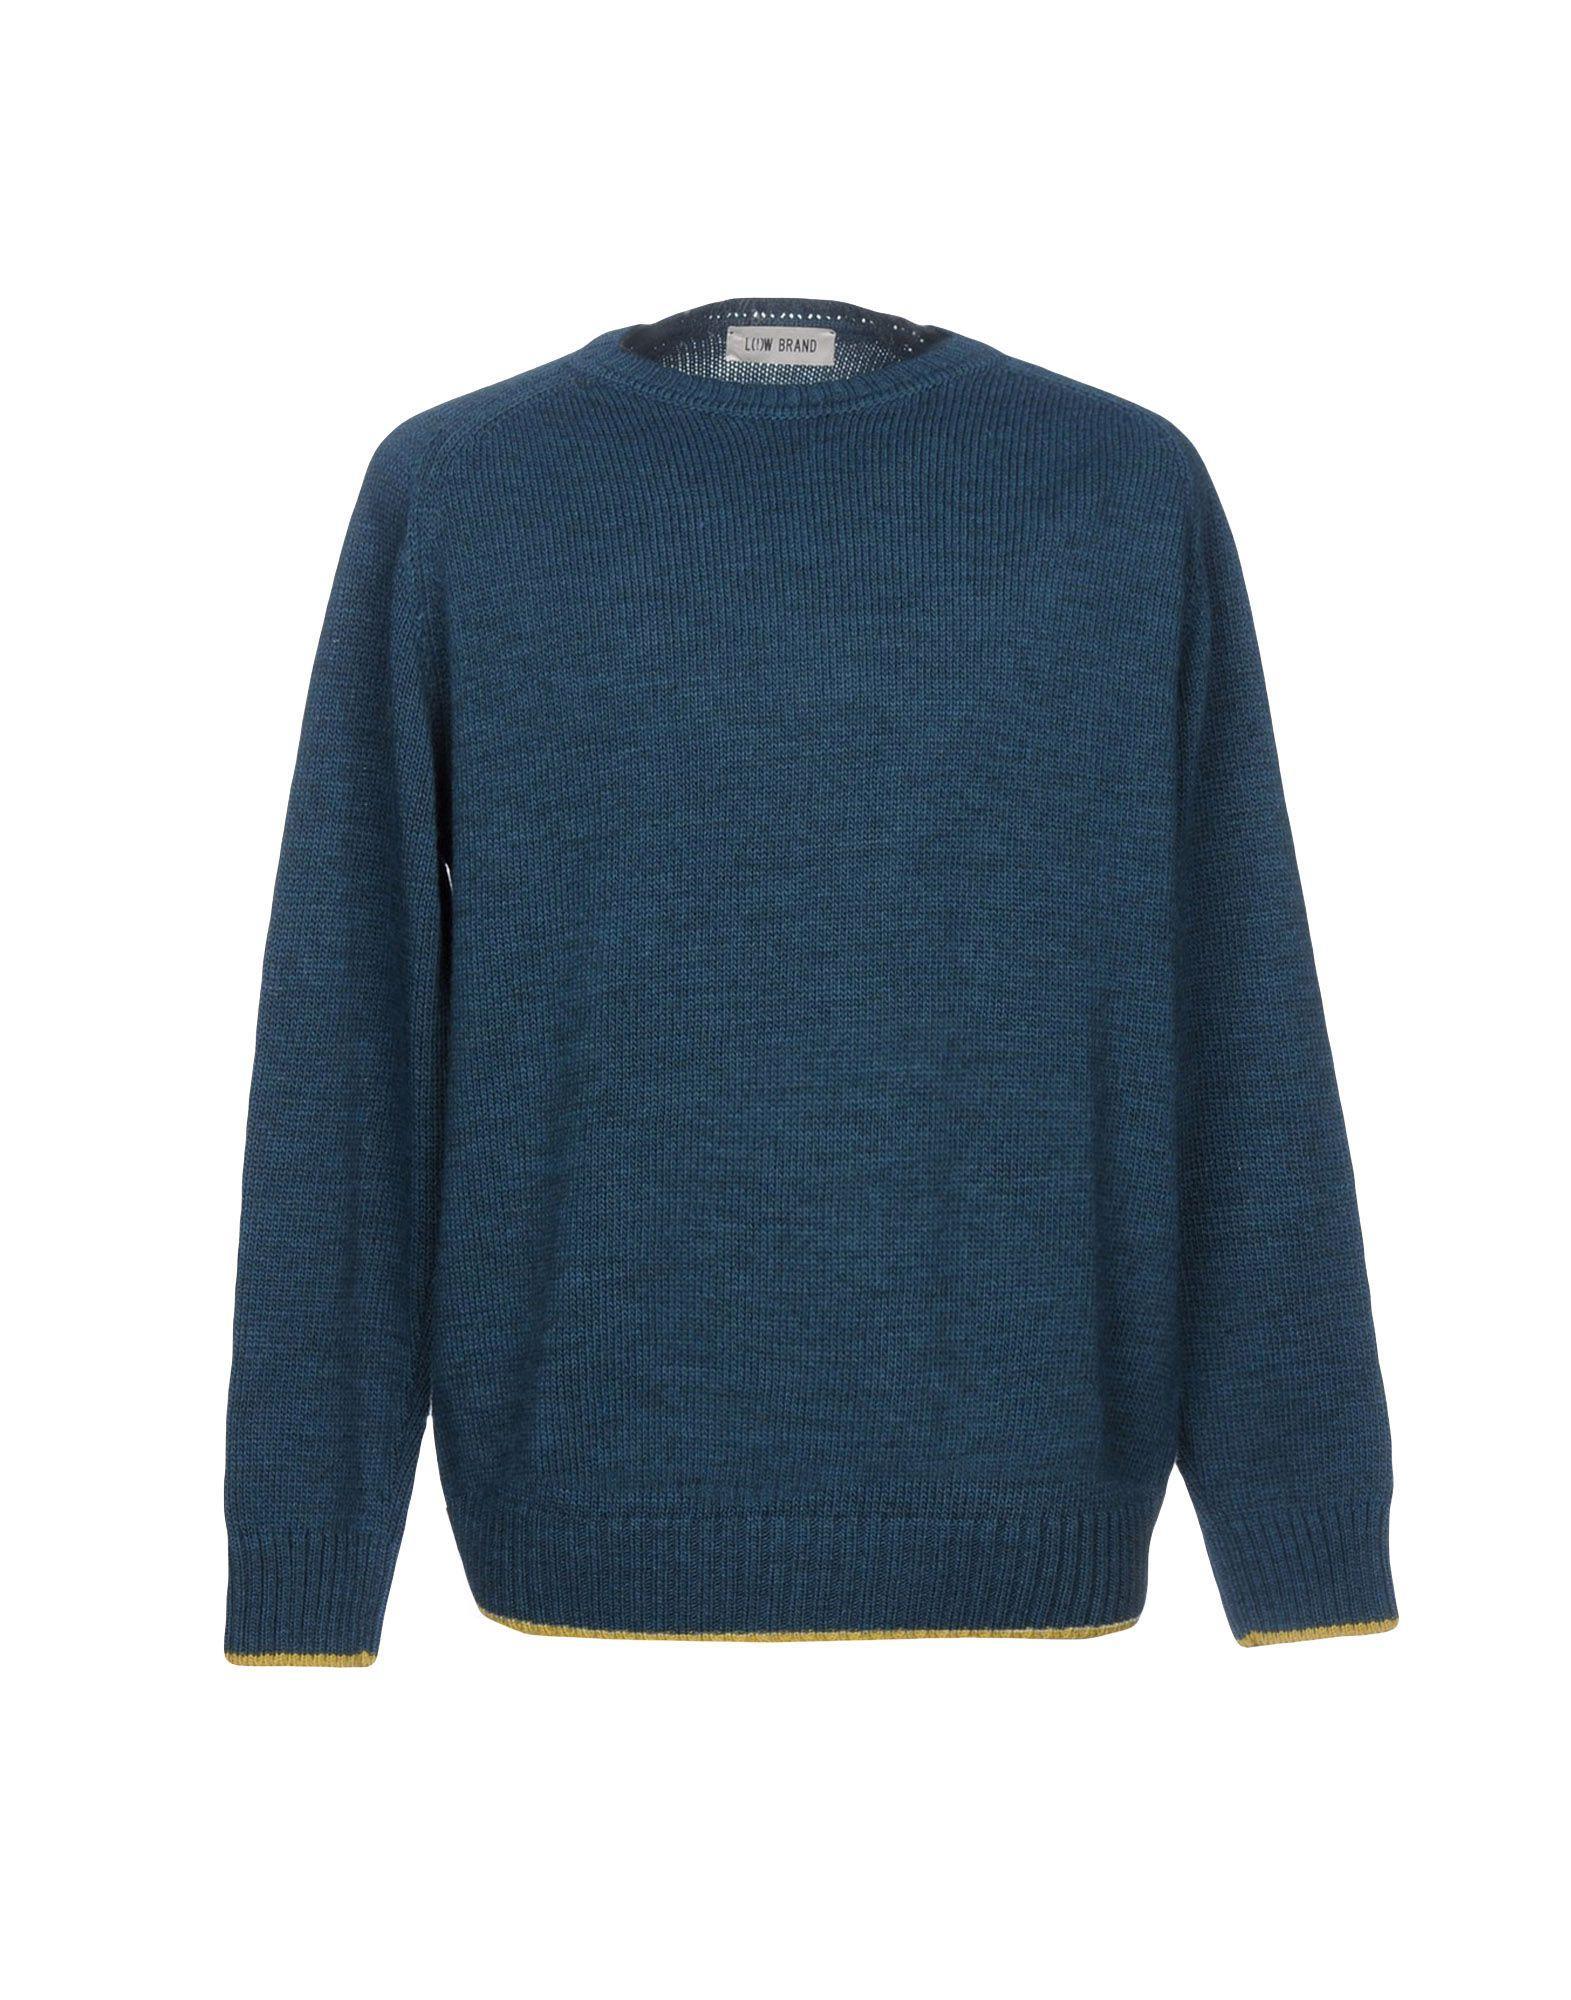 Low Brand Sweater In Deep Jade